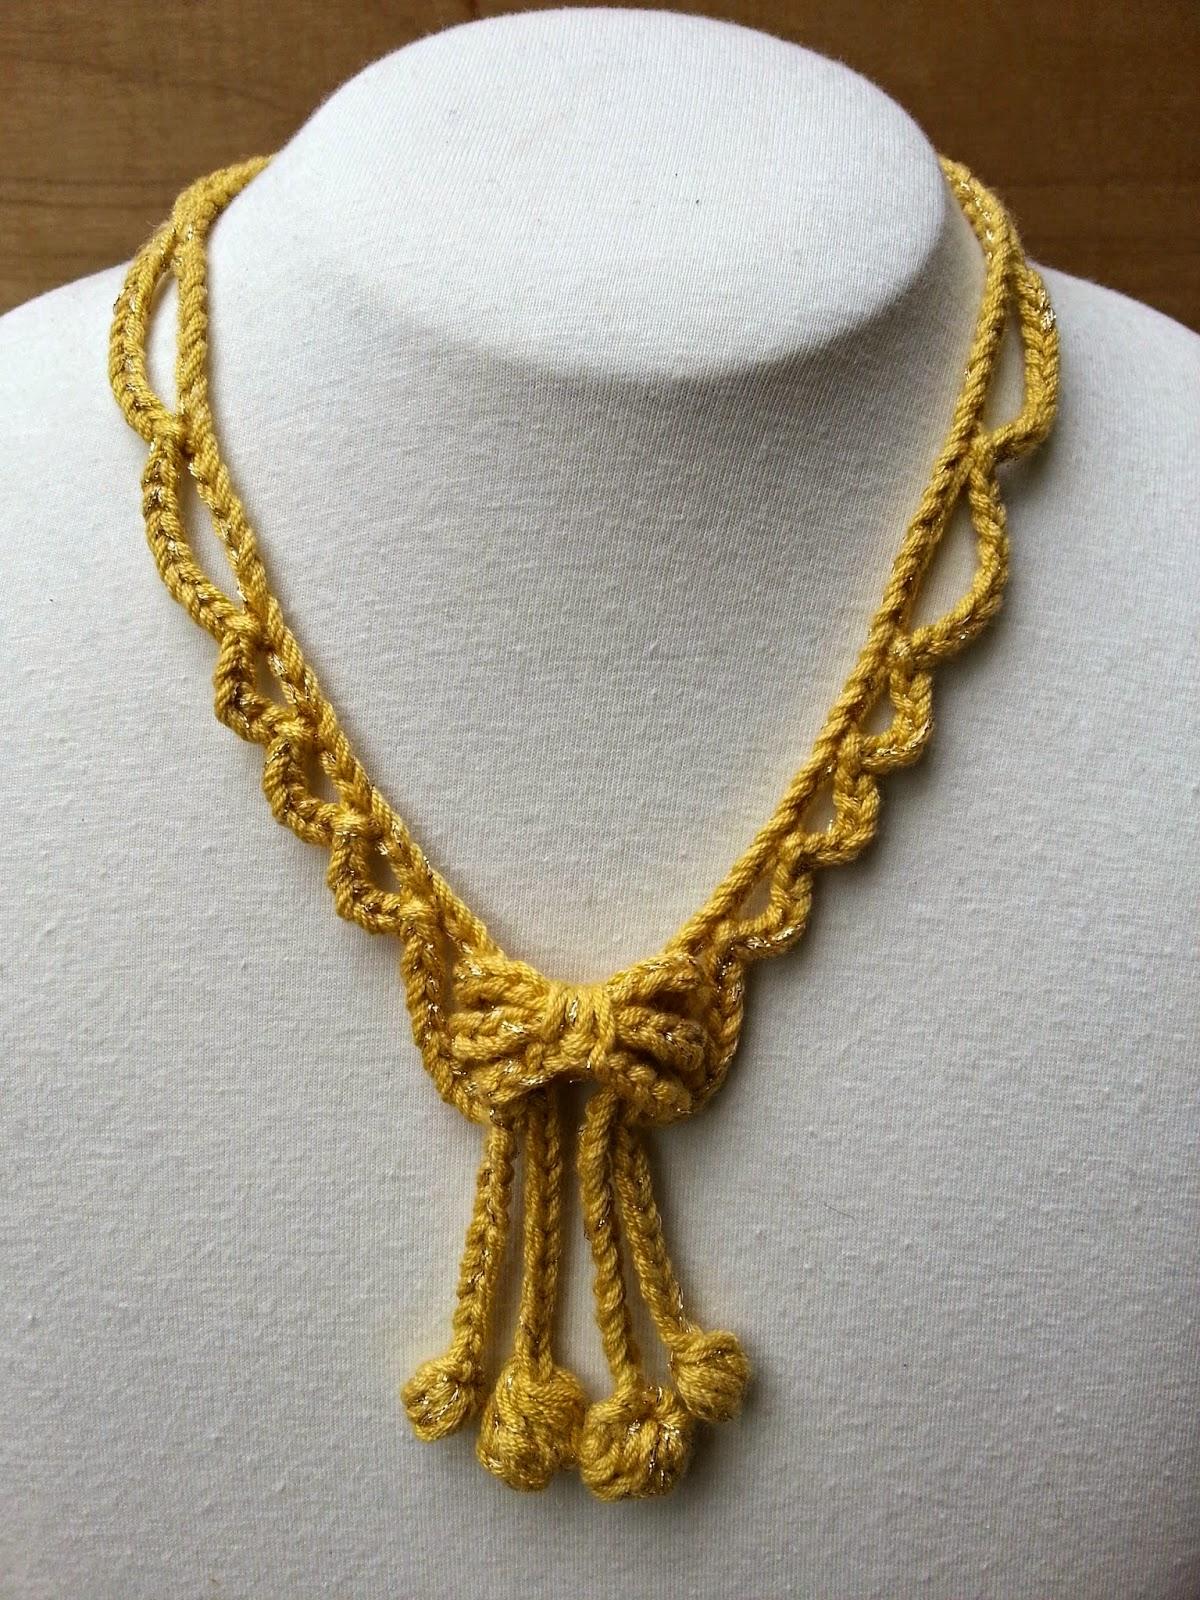 Stitch Story: New Free Crochet Jewelry Patterns for Kreinik!